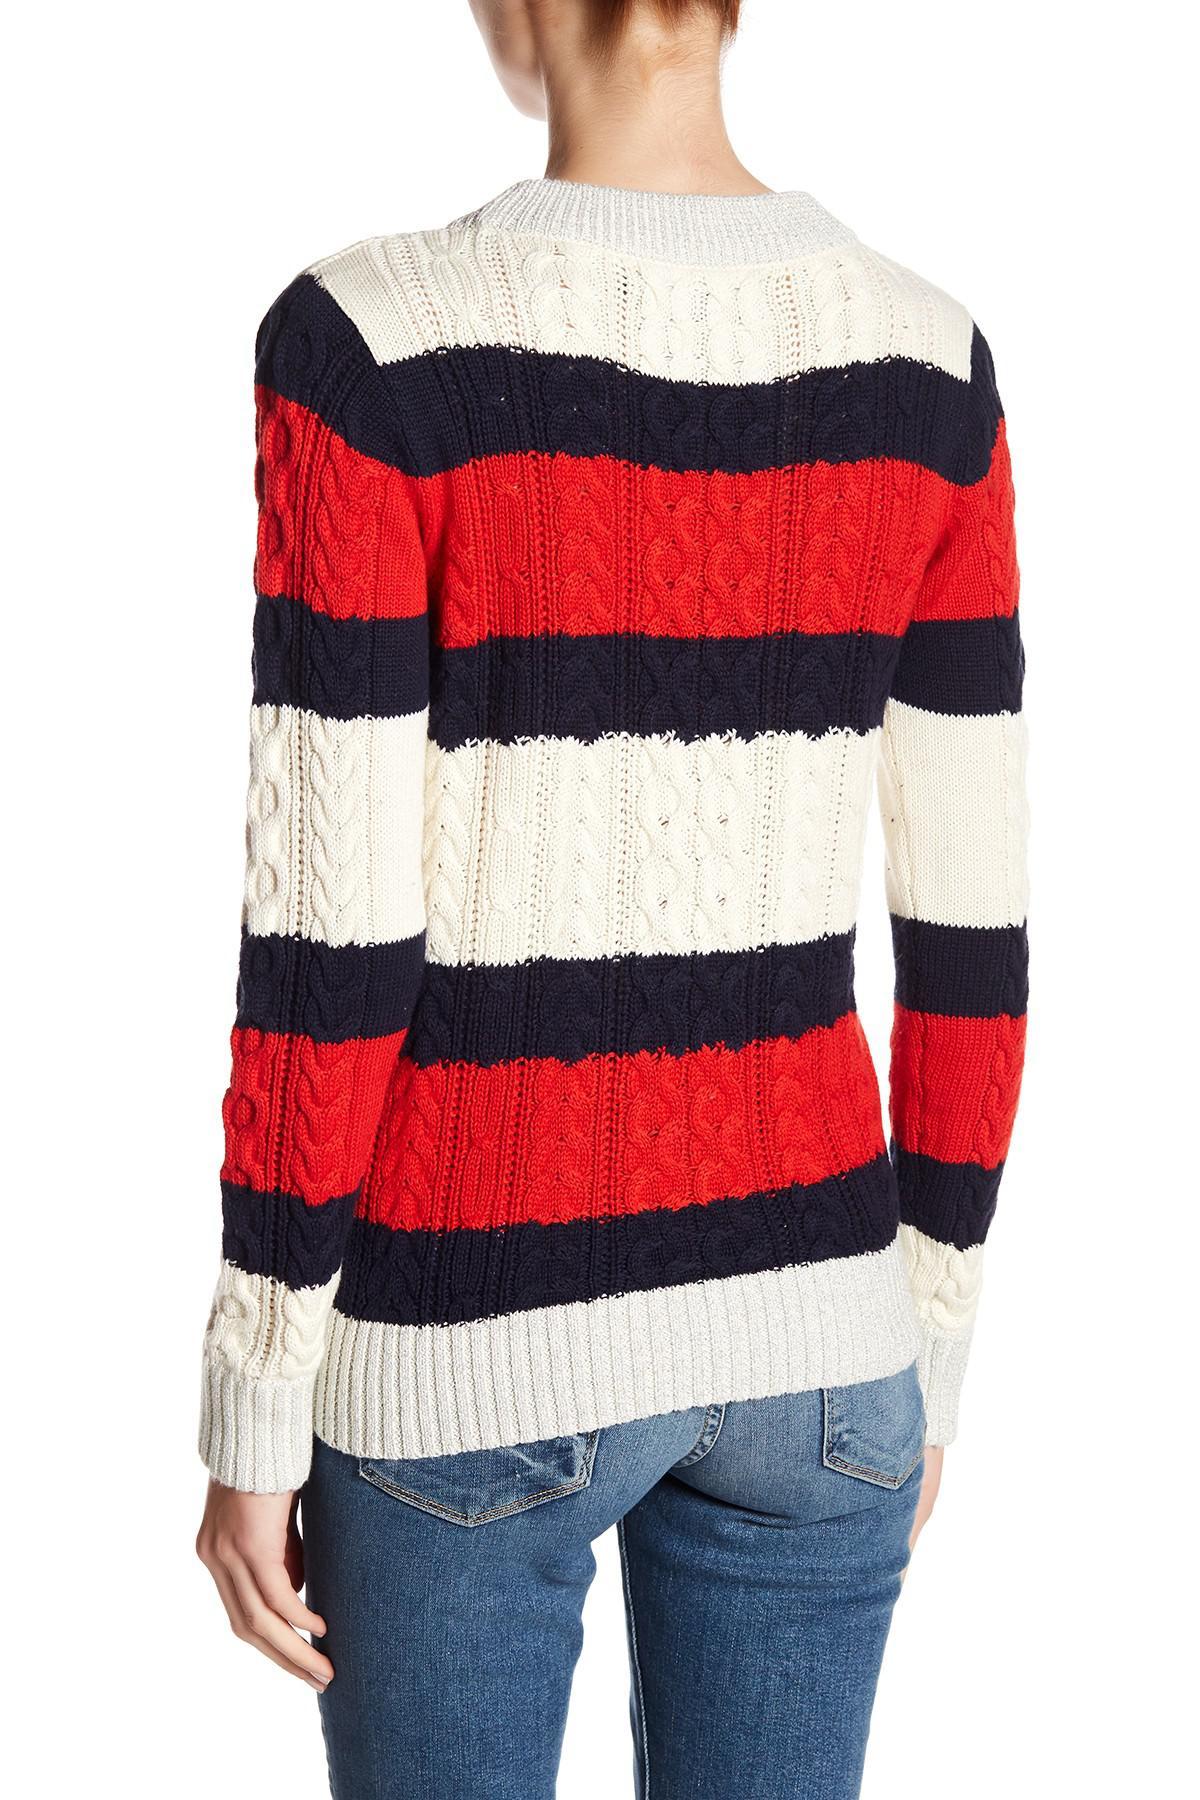 Vero Moda Knitting Patterns : Lyst vero moda striped knit sweater in red